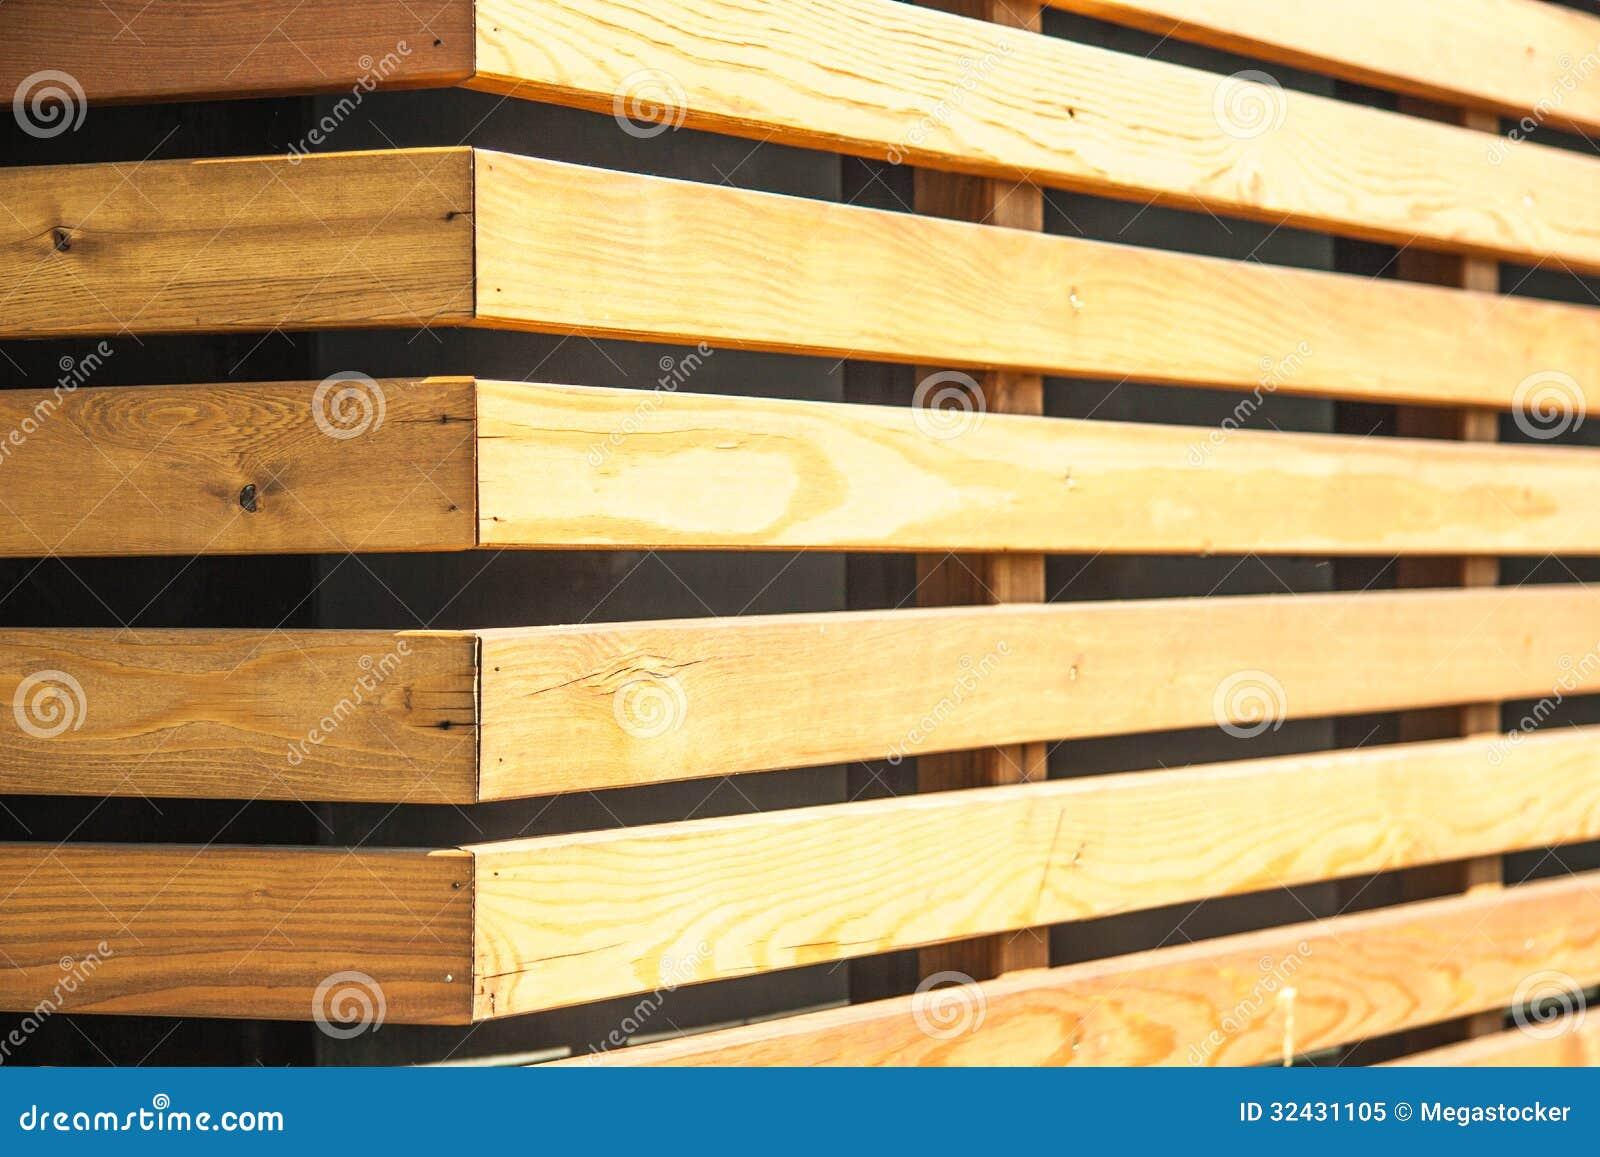 Light Wood Wall Paneling : Wall of wood panels royalty free stock photo image